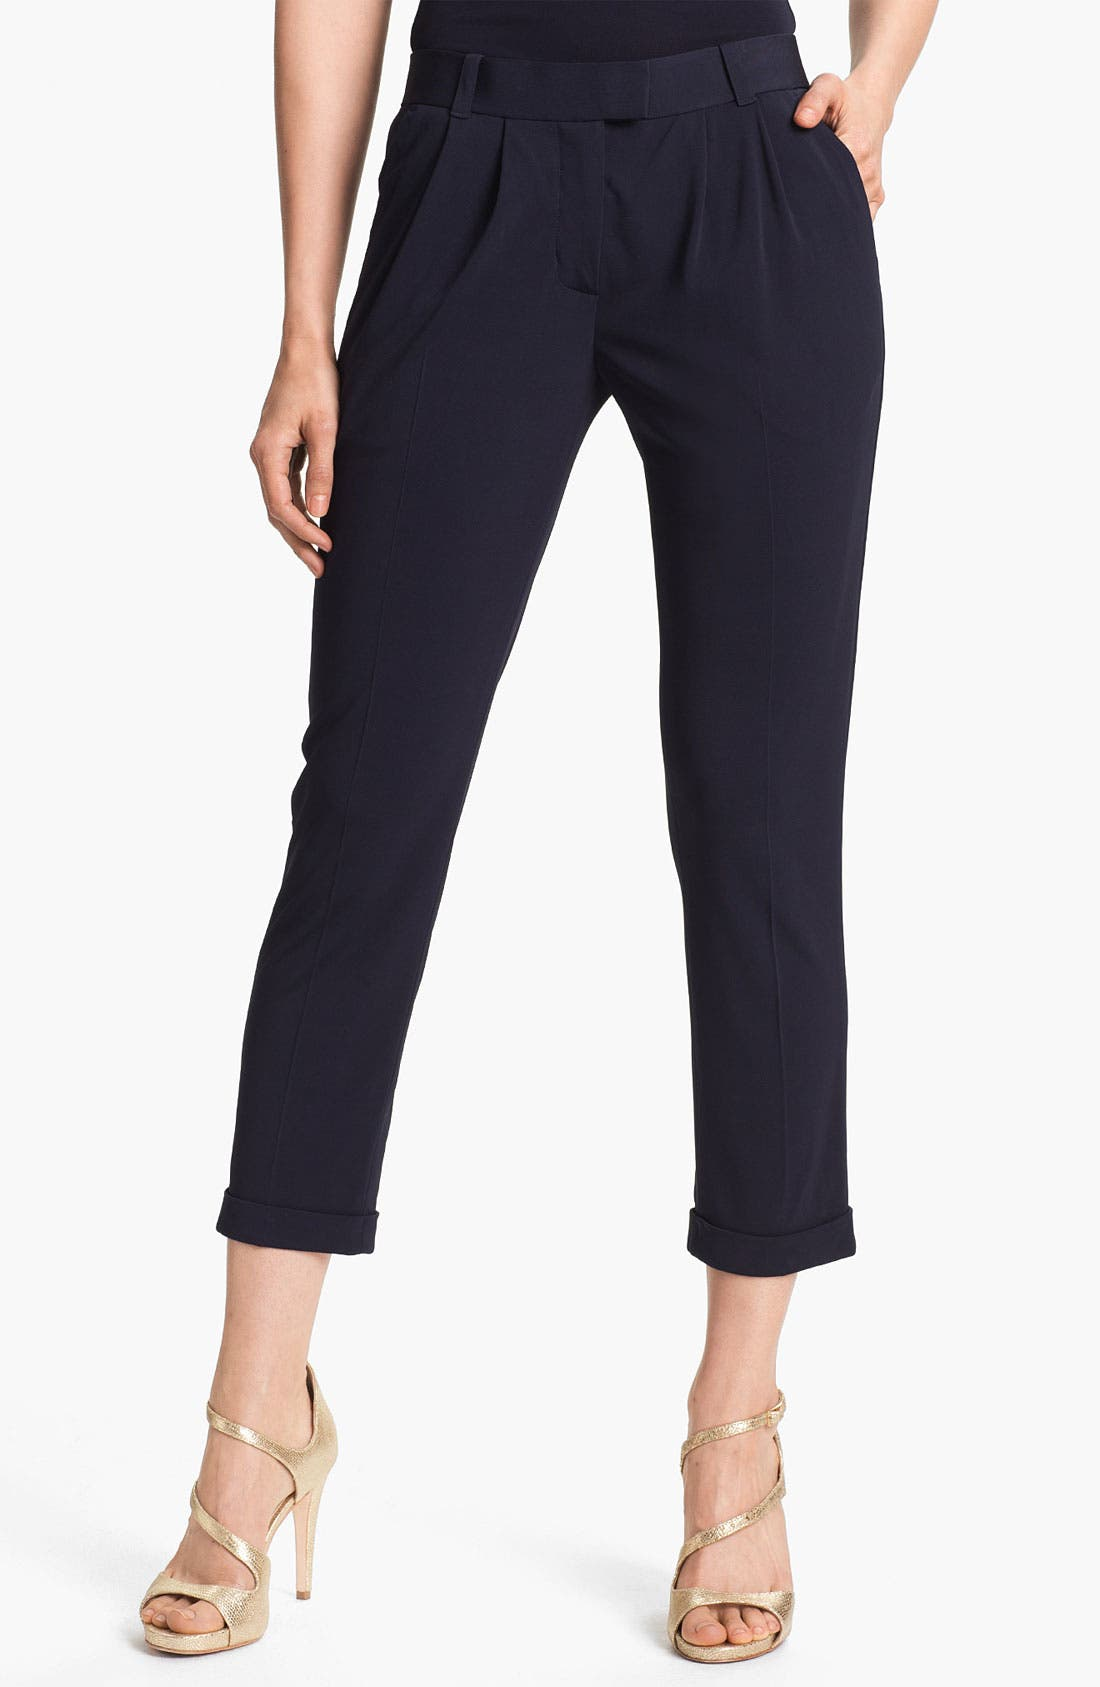 Main Image - Tory Burch 'Haley' Crop Pants